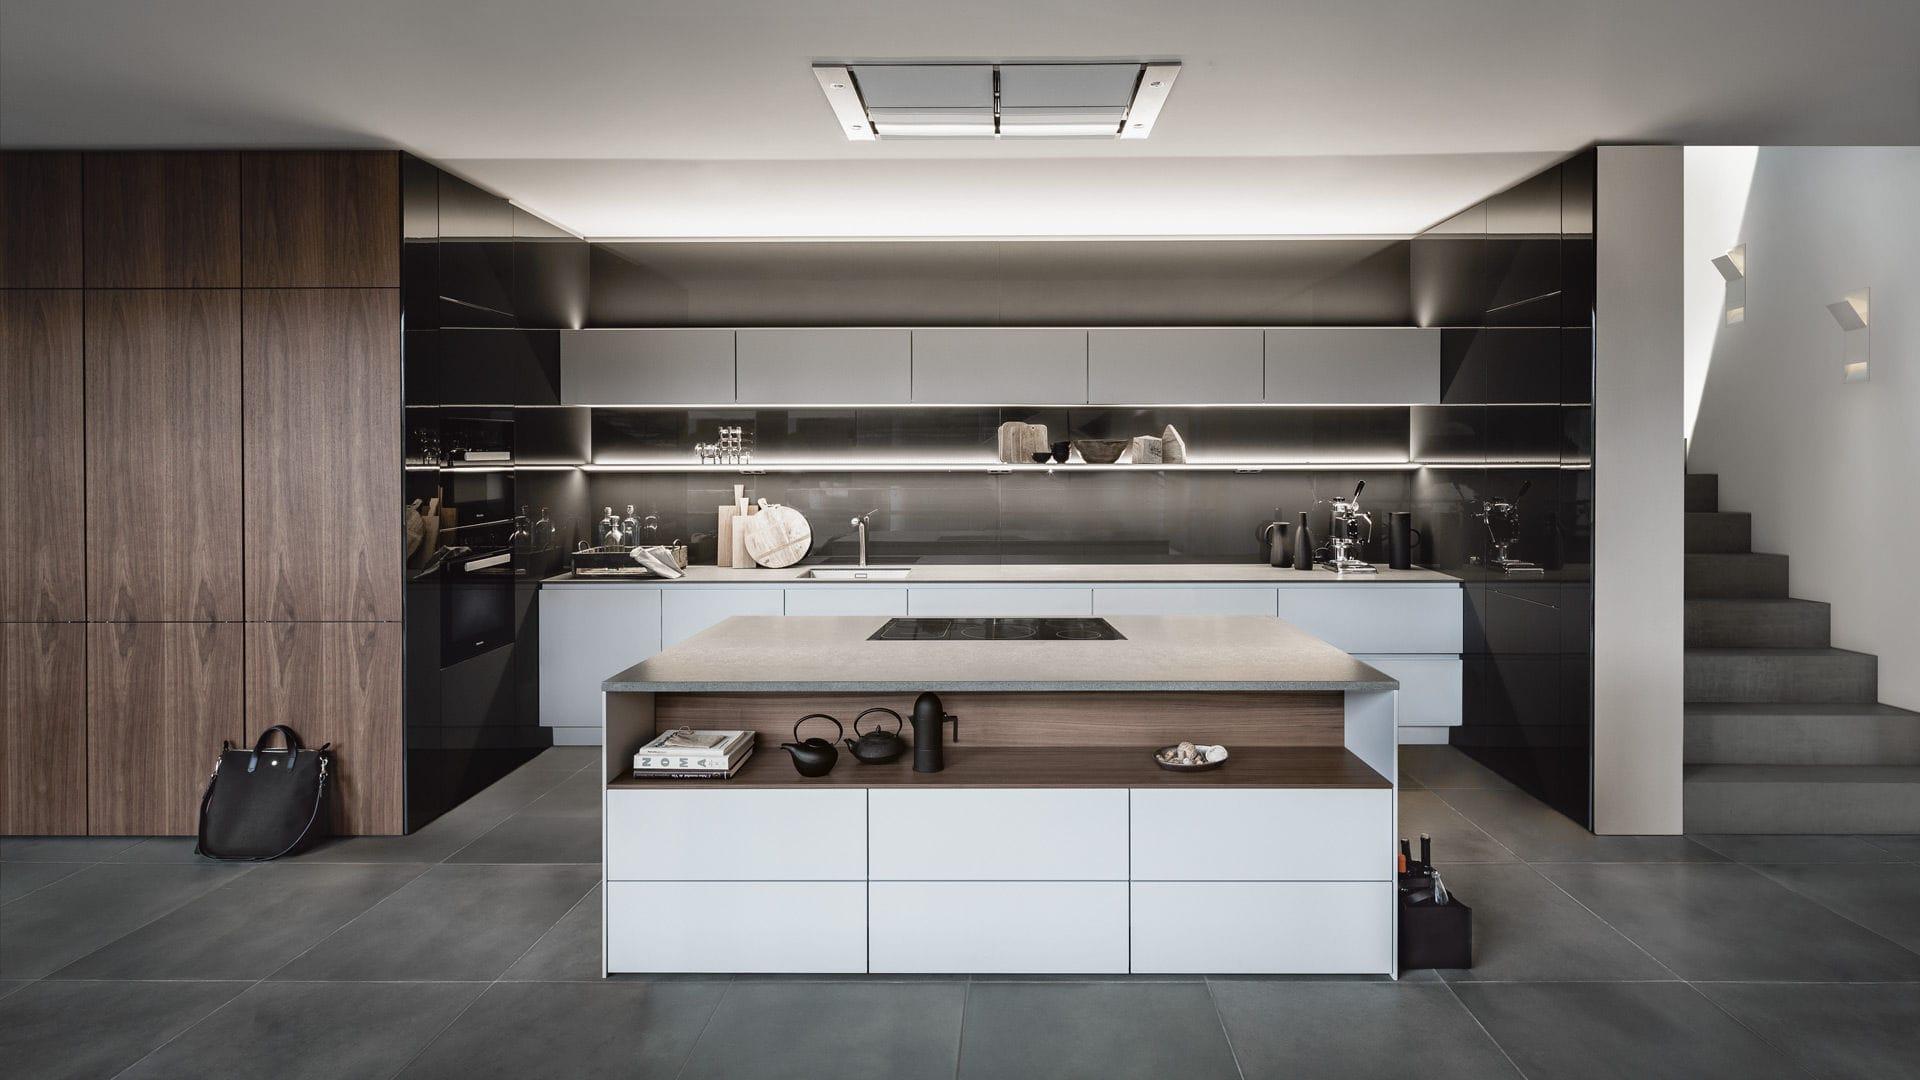 Moderne landhausküche siematic  Moderne Küche / lackiertes Holz / Holzfurnier / Kochinsel - PURE ...